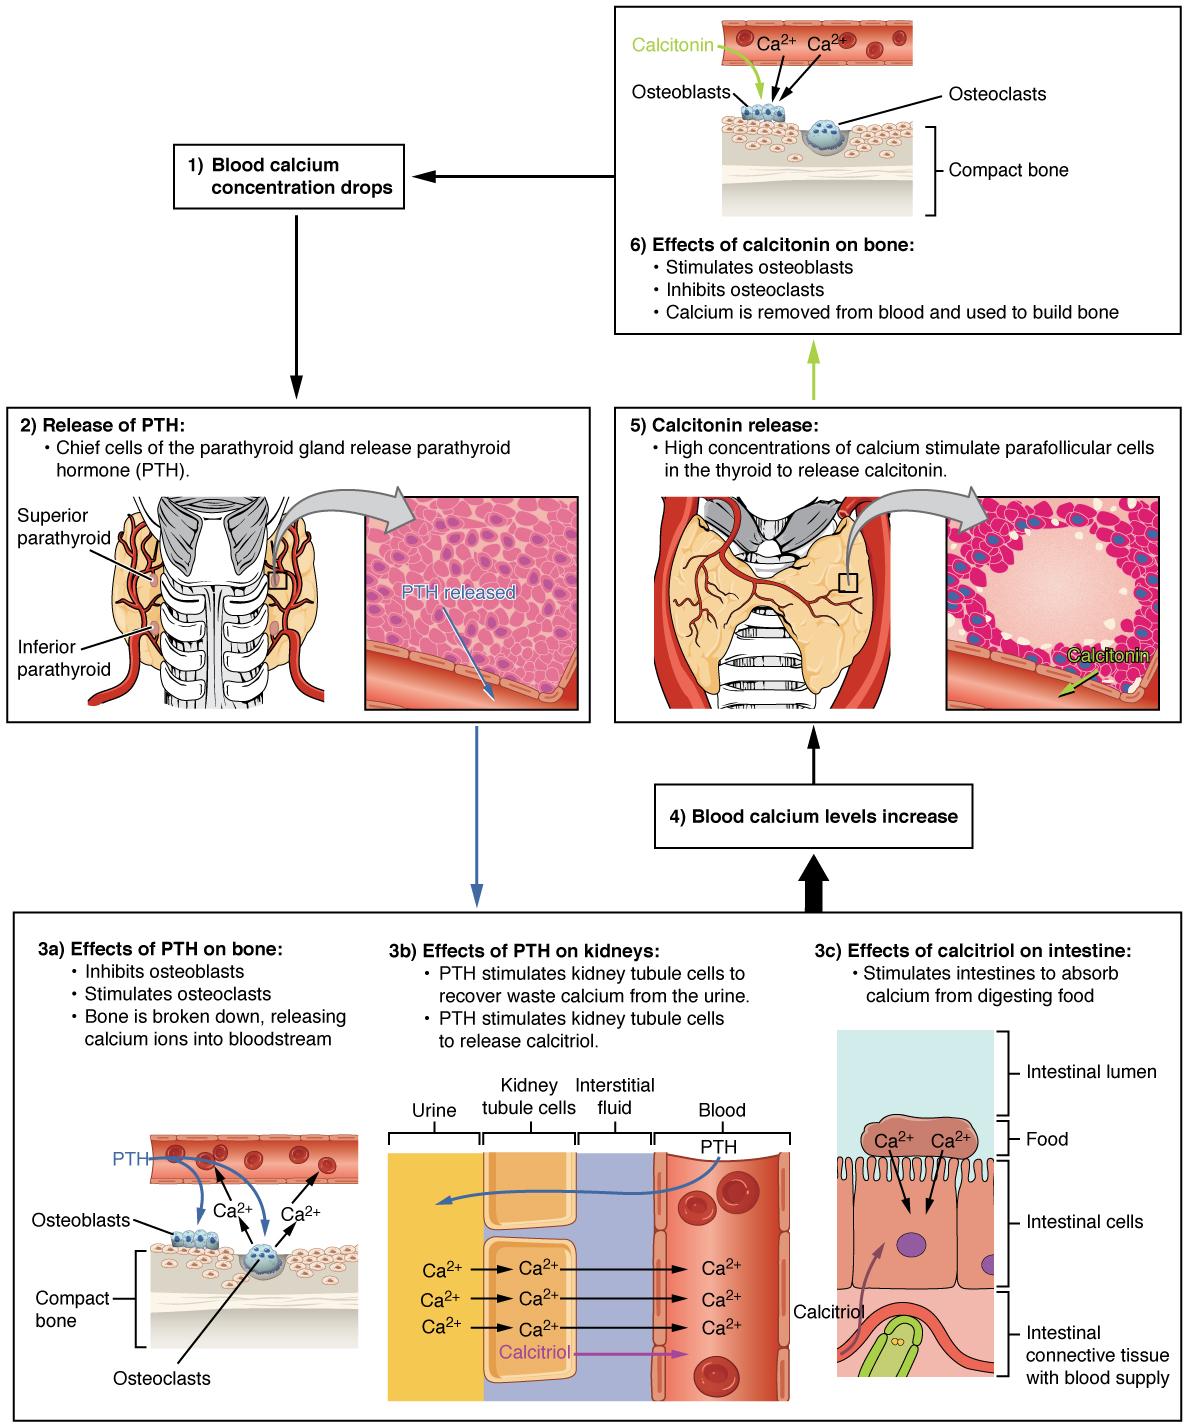 Illustrations showing parathyroid hormone maintaining blood calcium homeostasis